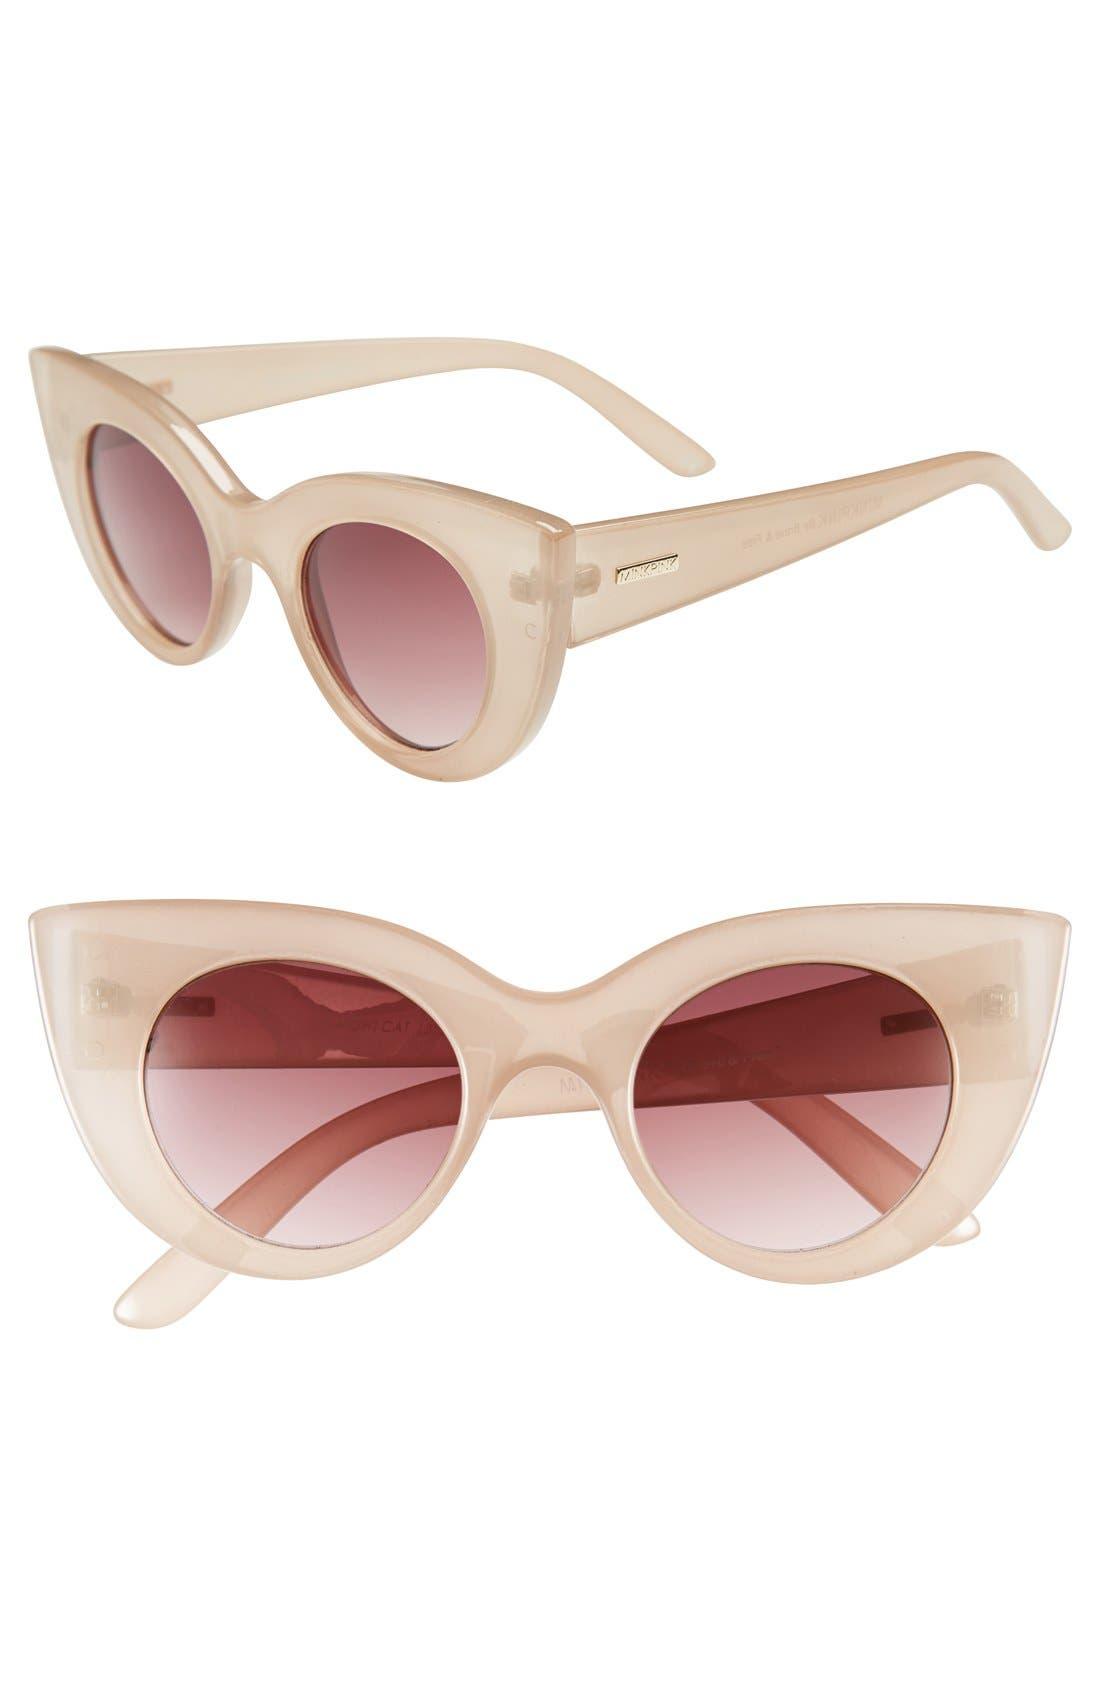 Main Image - MINKPINK 'Love Cat' 44mm Sunglasses